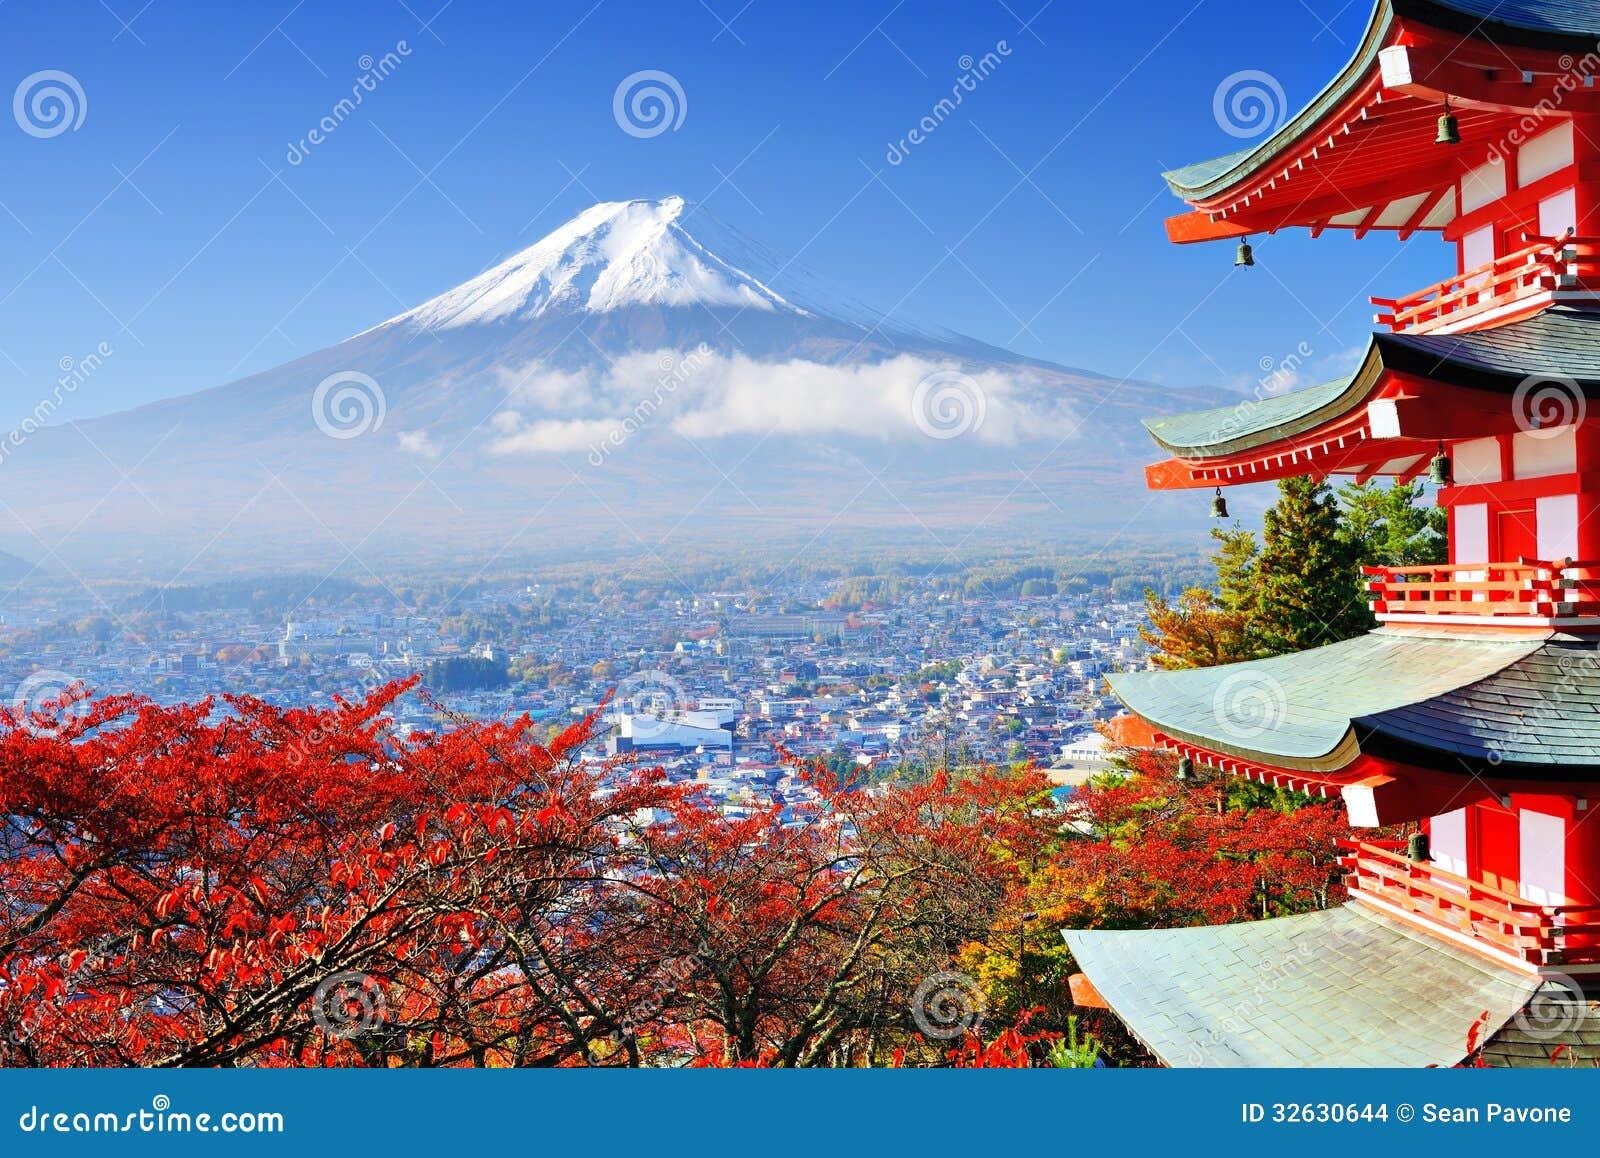 Hotel Near Mt Fuji Japan